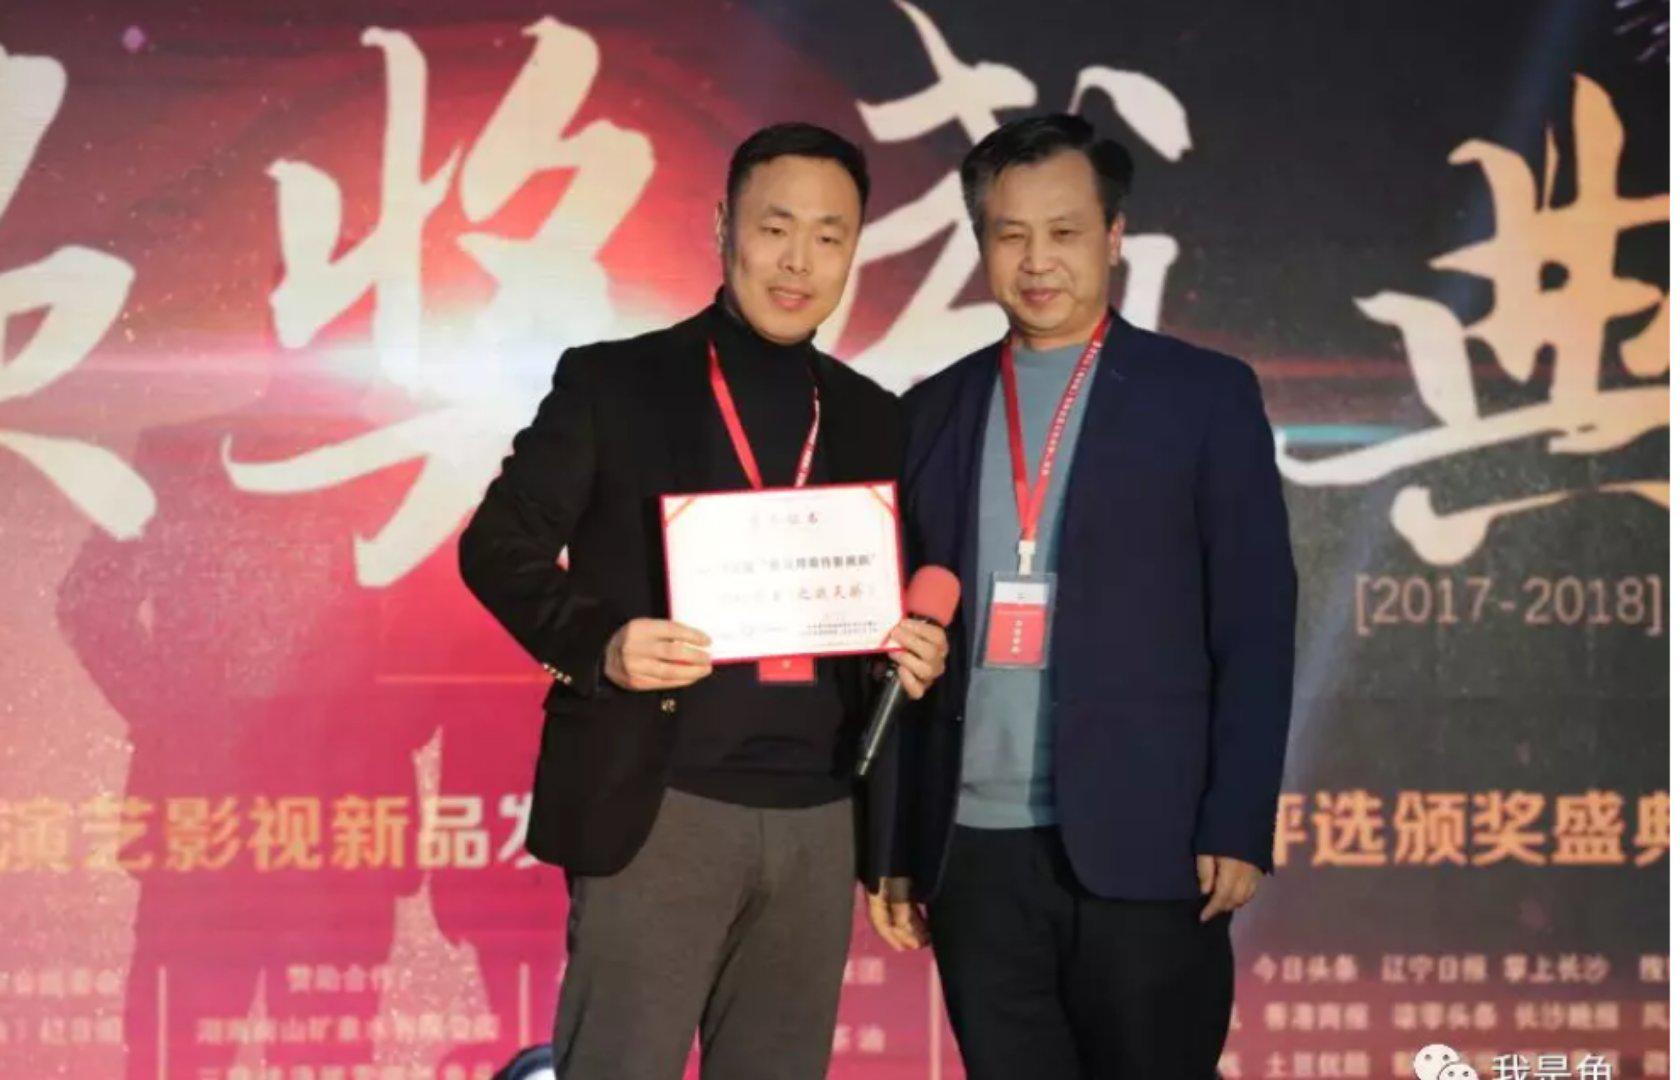 http://himg2.huanqiu.com/attachment2010/2018/0306/20180306040825289.png